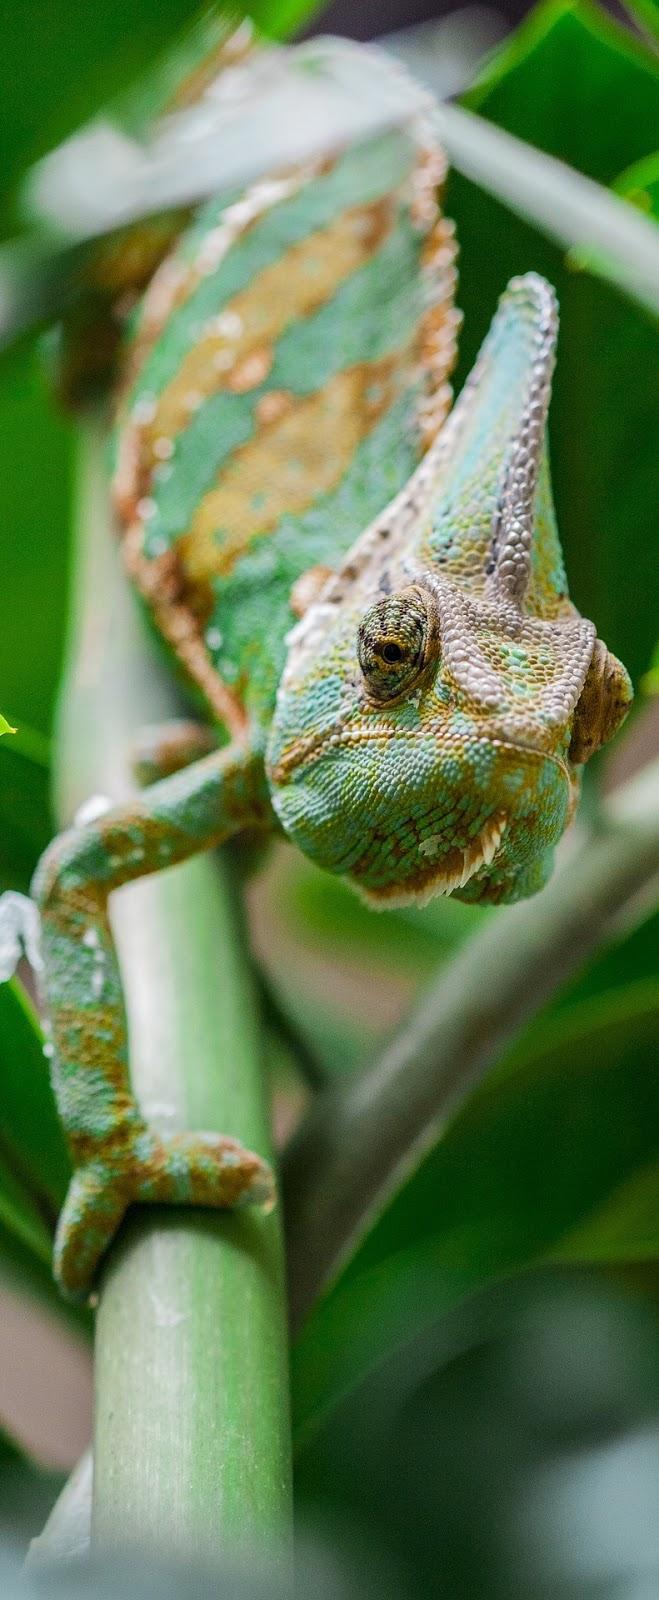 Photo of a chameleon.